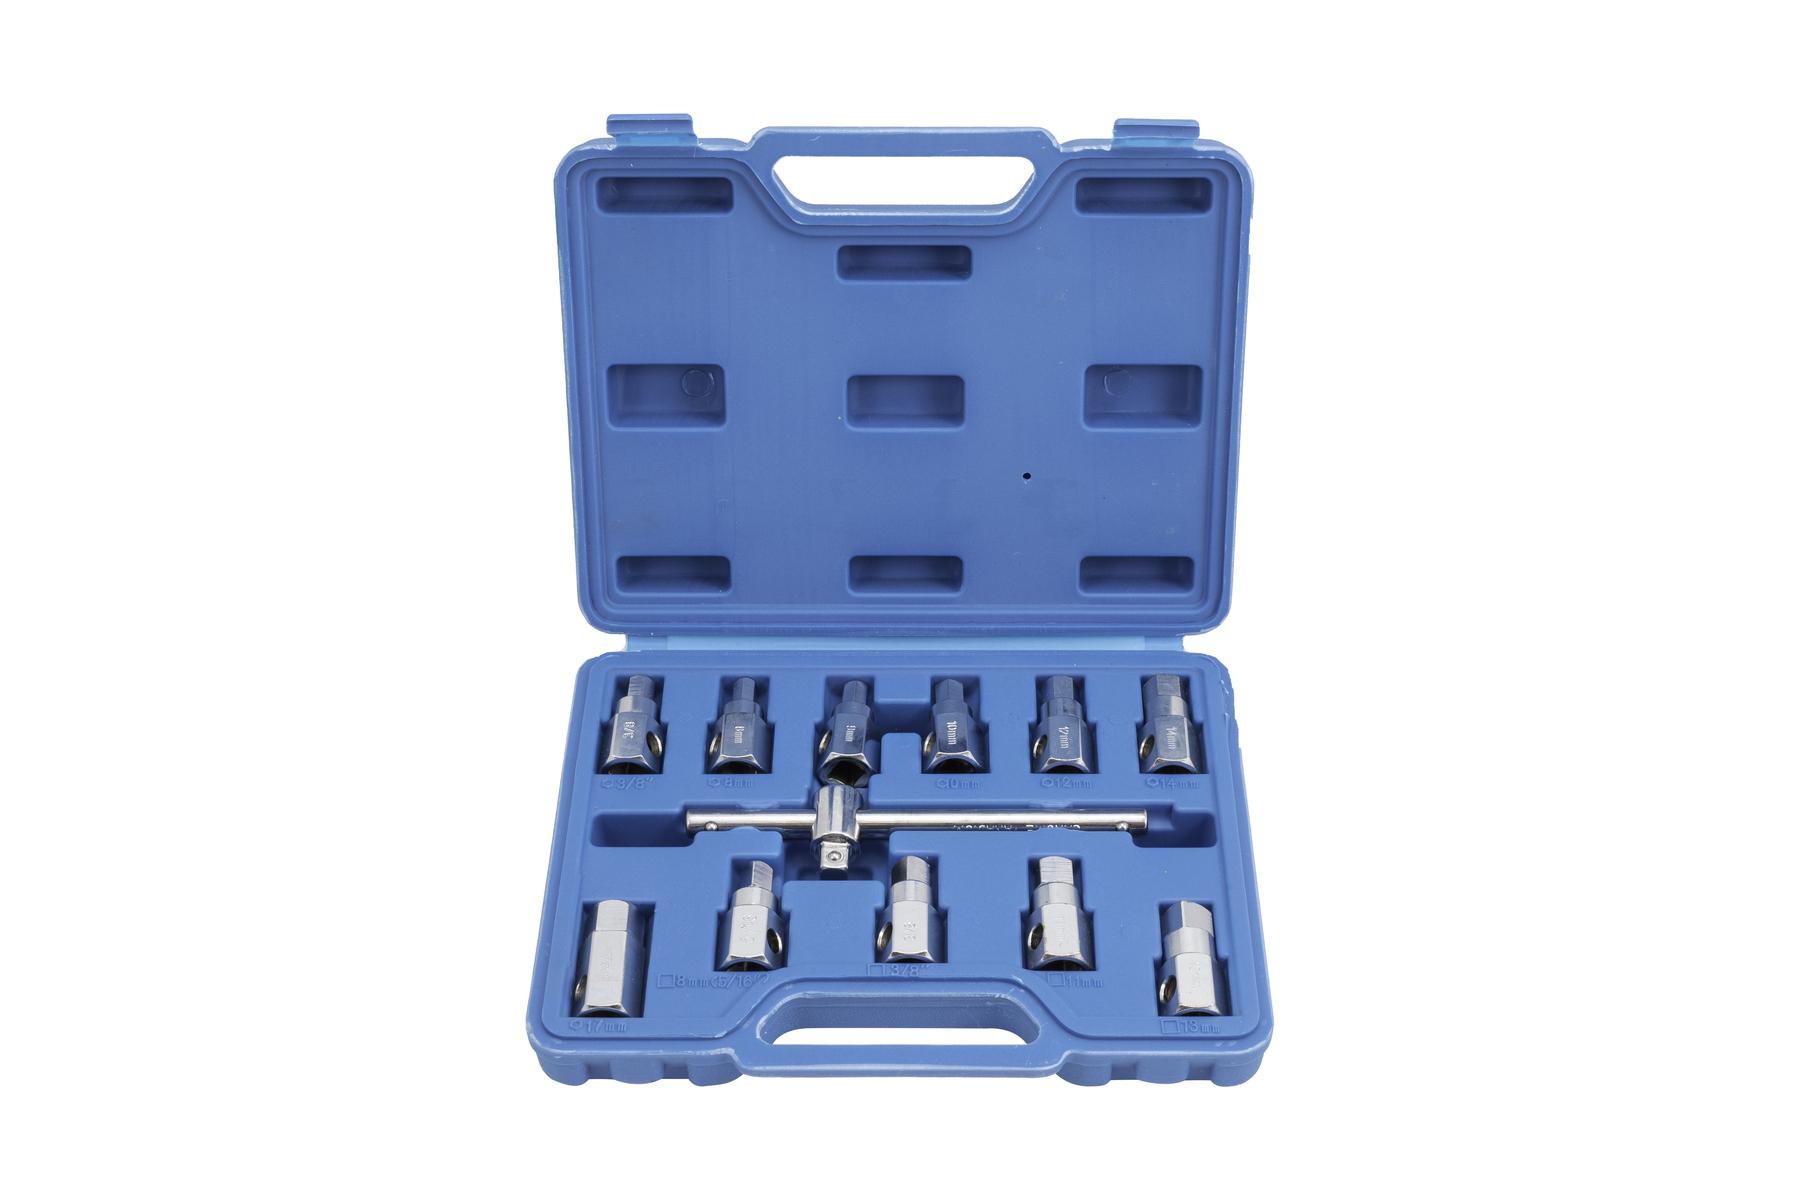 Klíče na šrouby olejových van, sada 12 kusů - QUATROS QS60500